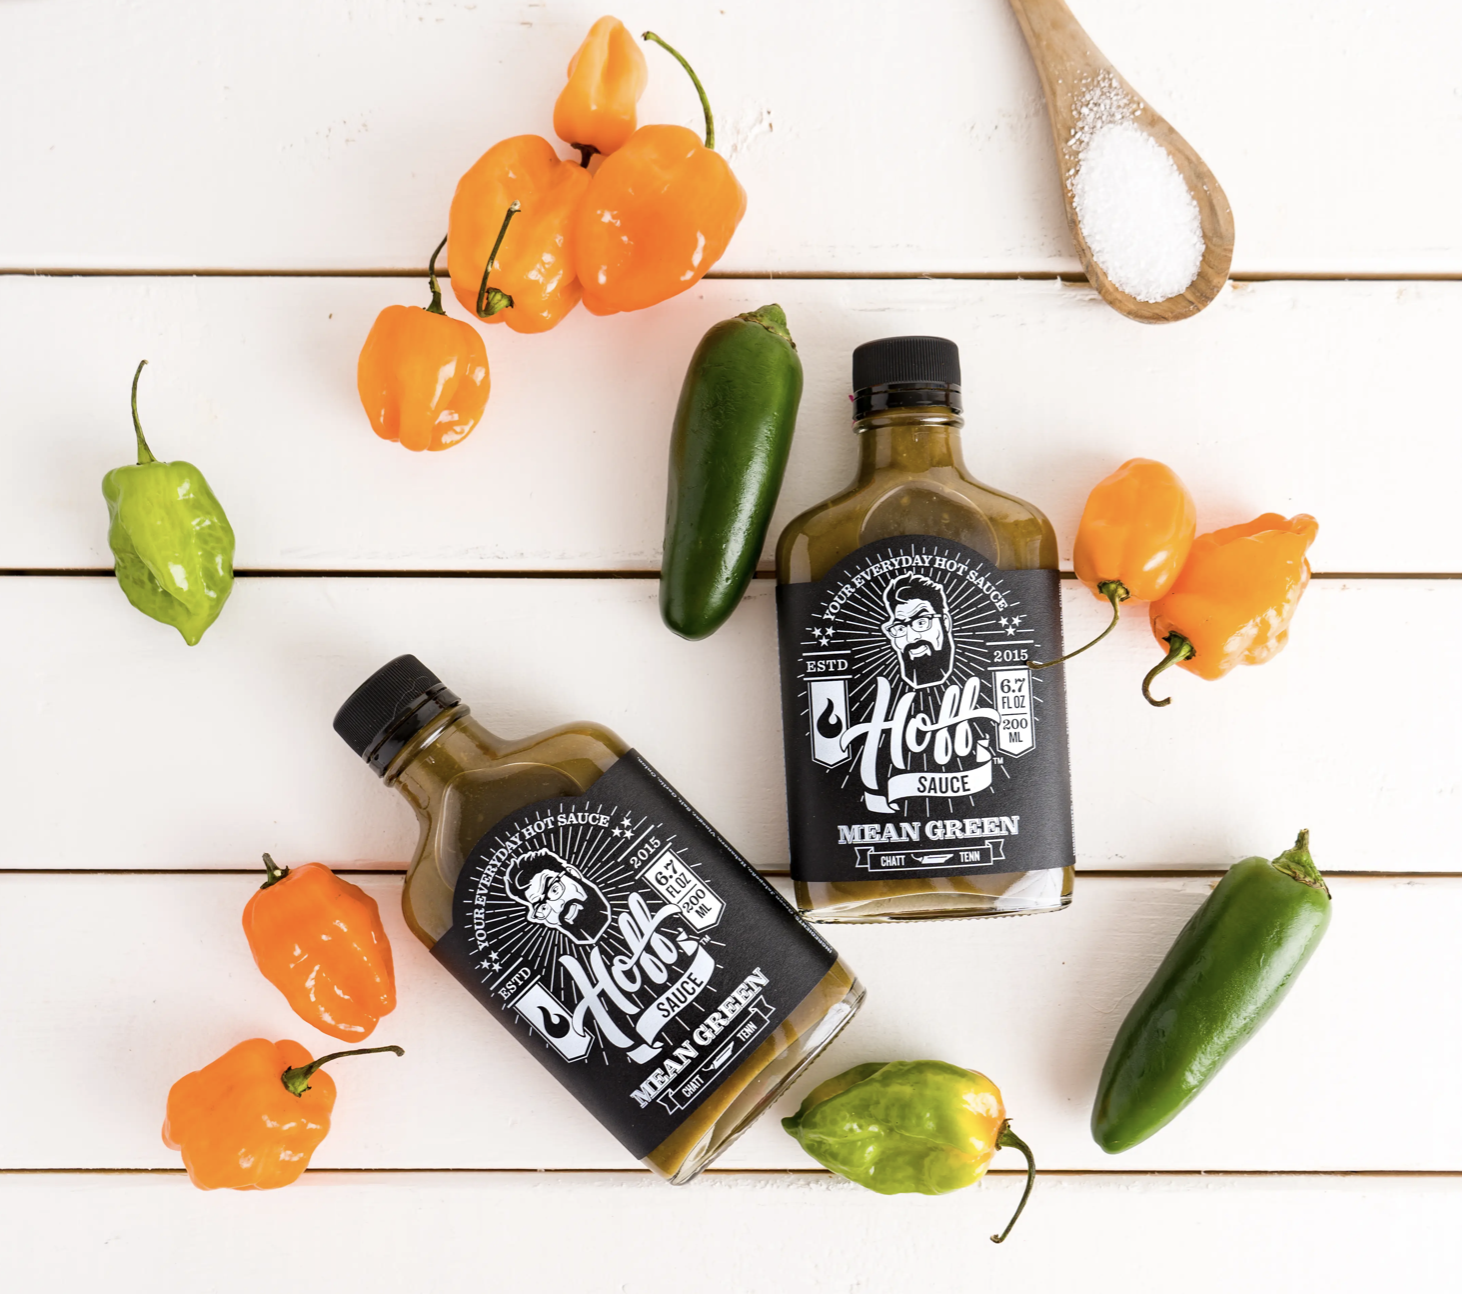 Hoff Sauce, Mean Green, 6.7 fl oz